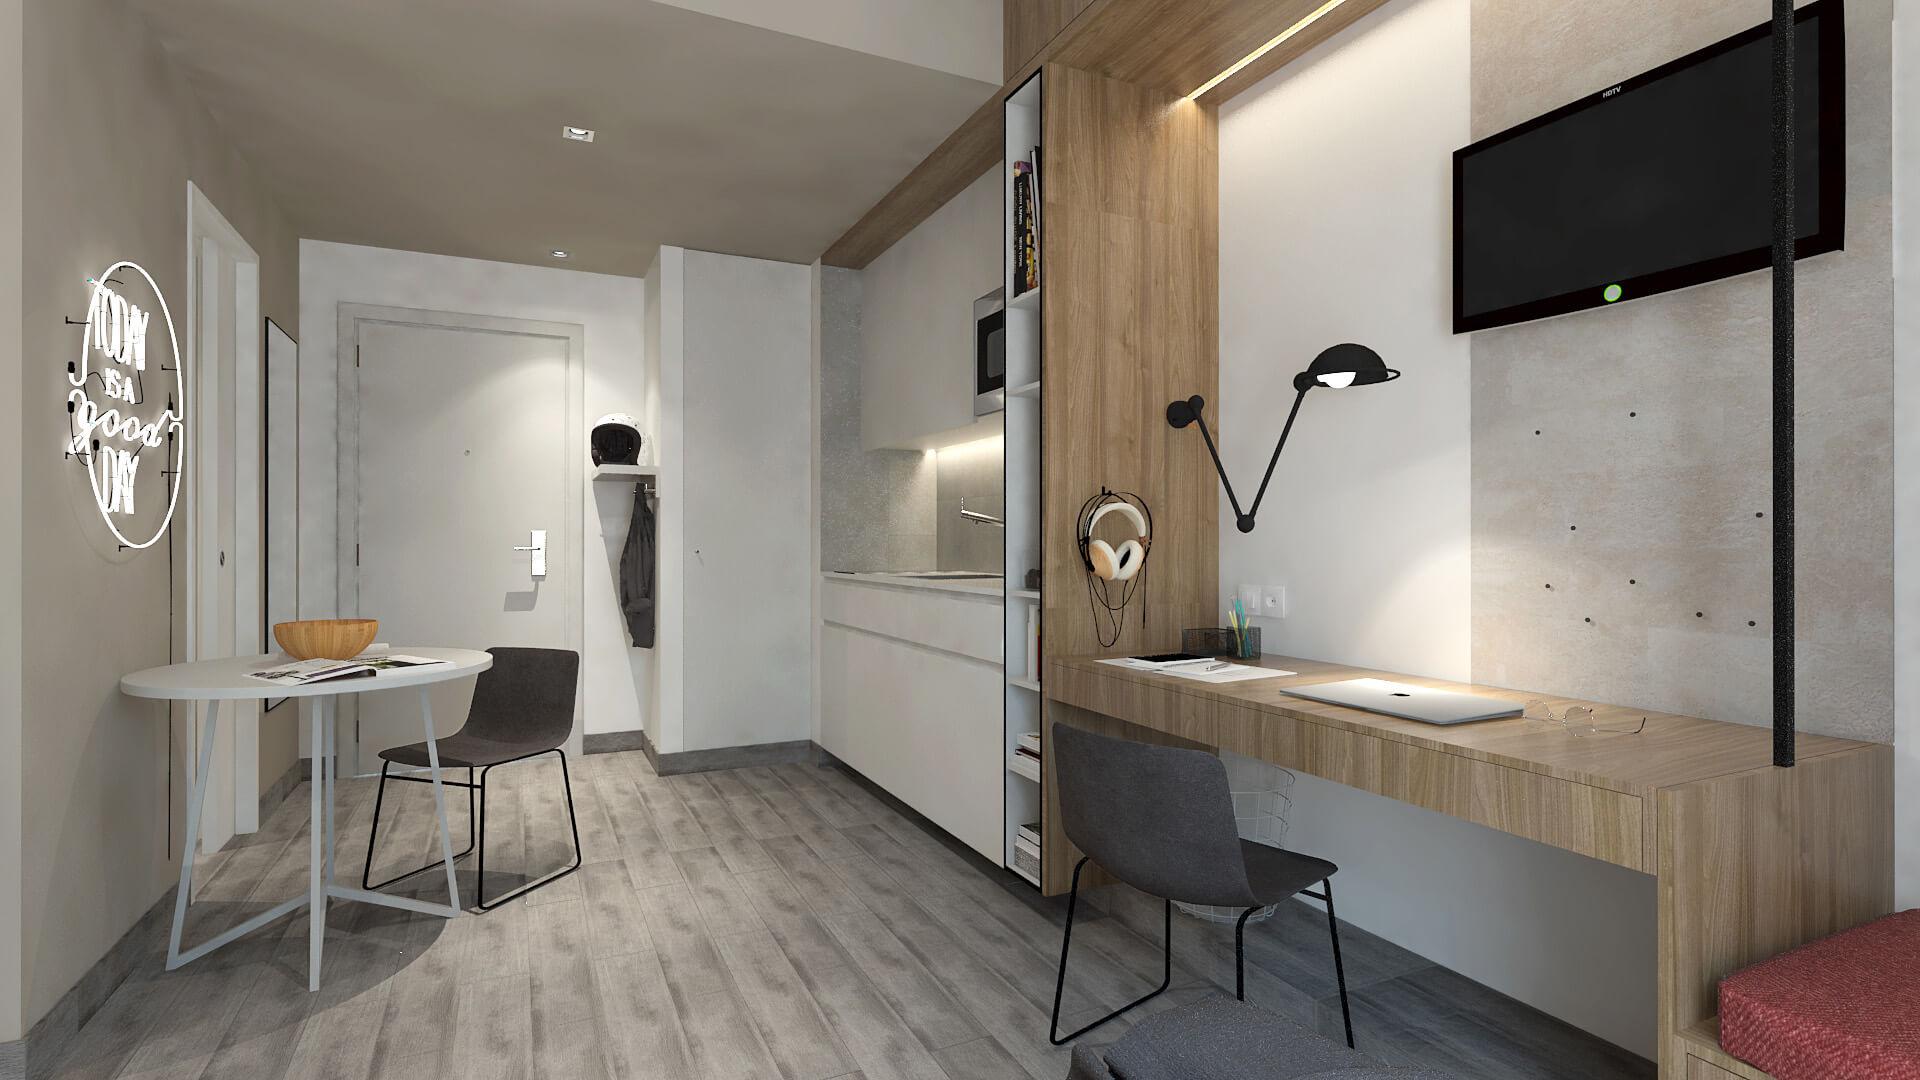 T0+ - Cozinha - U-LOFT Braga